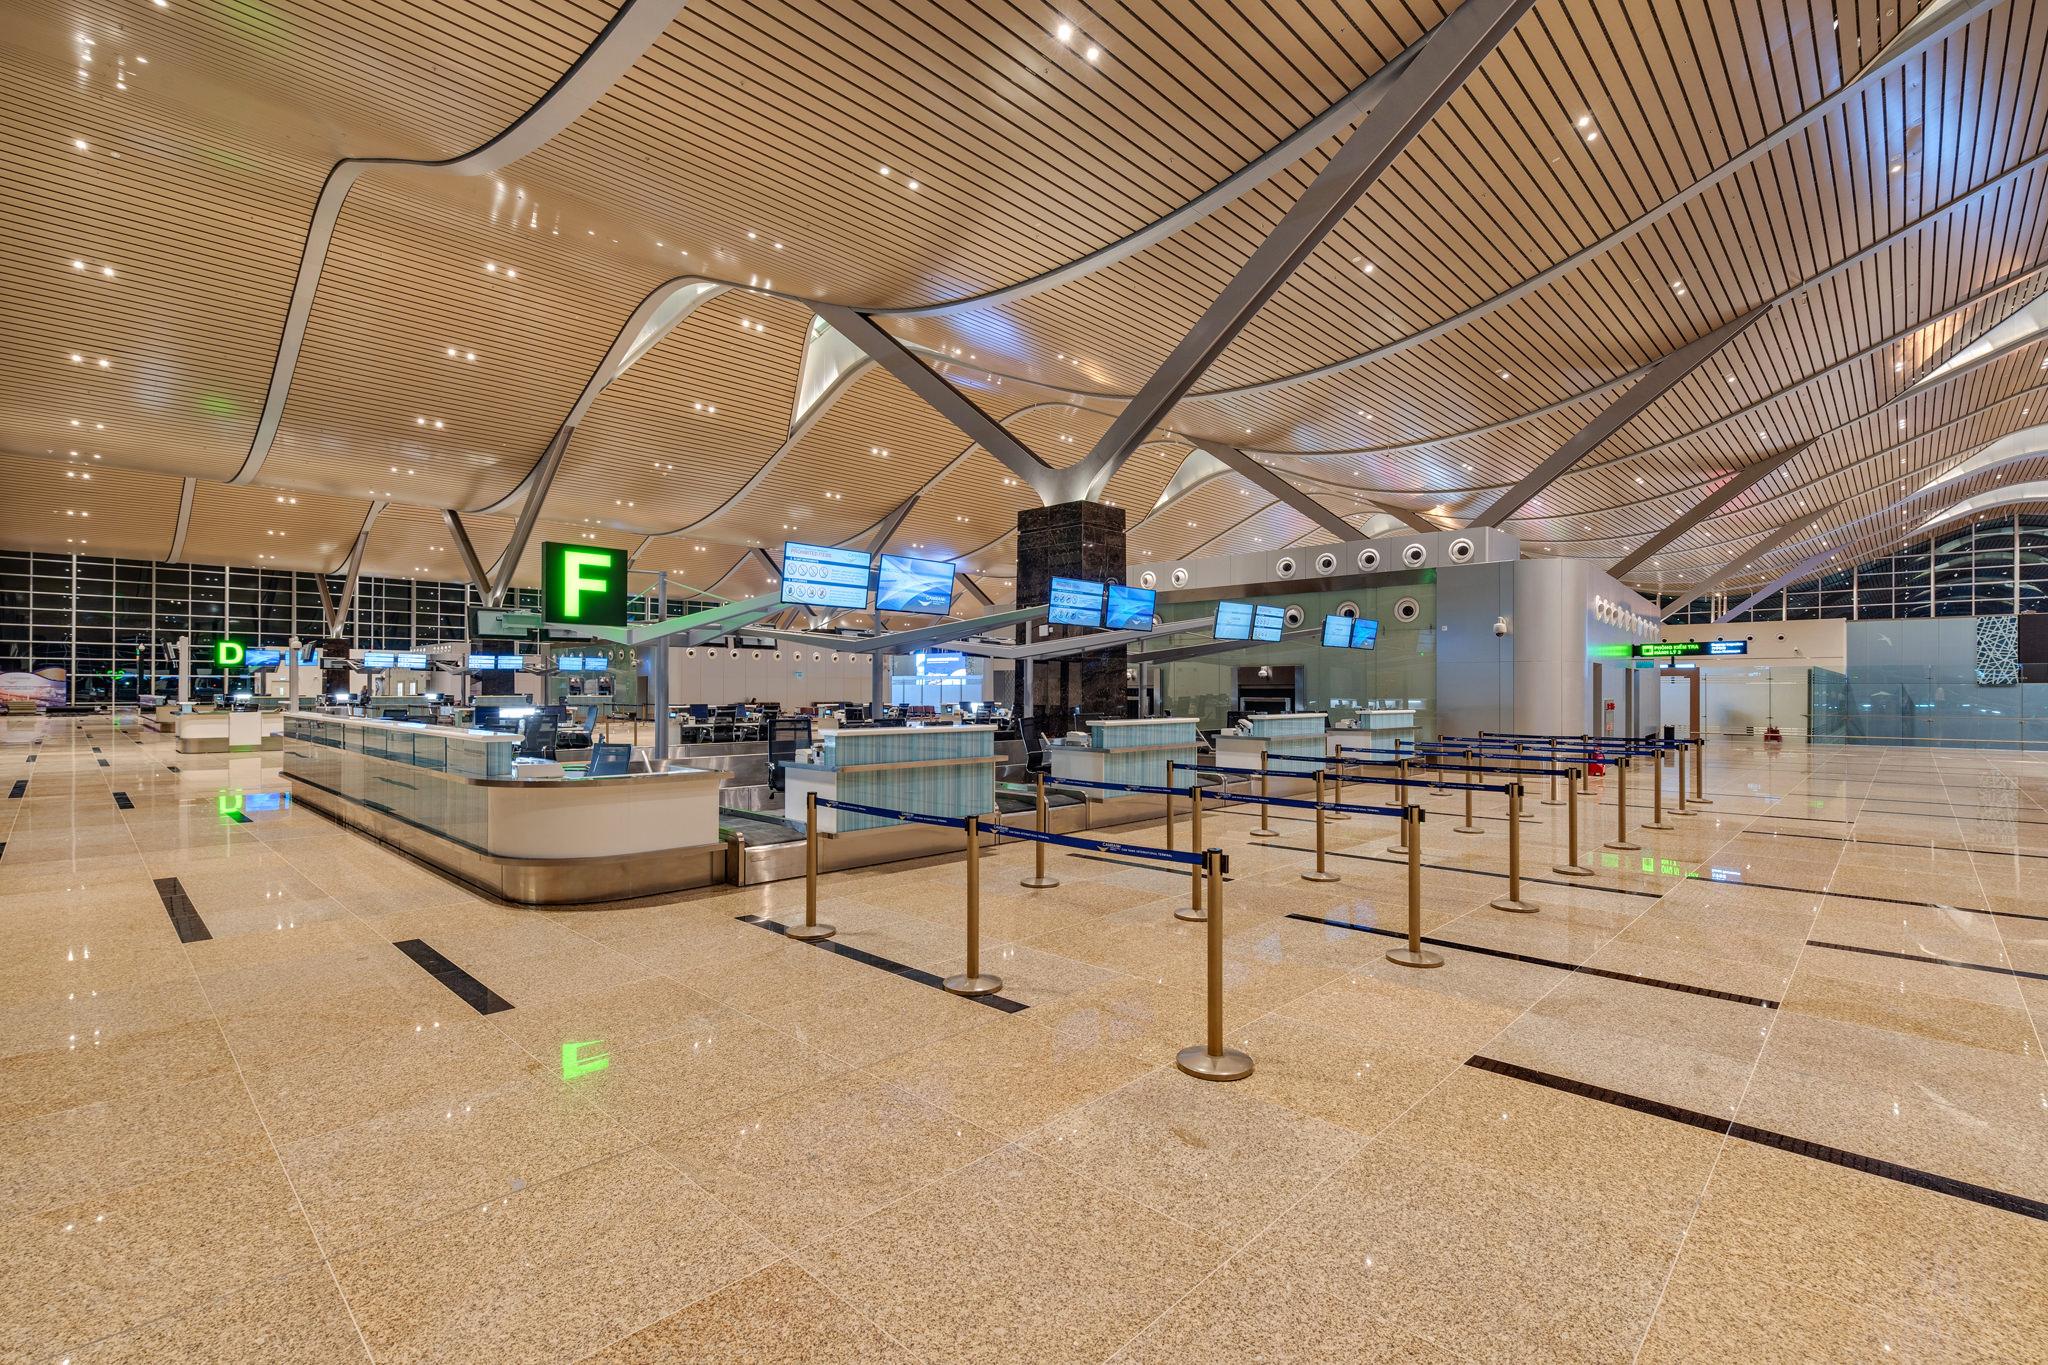 20180626 - Cam Ranh Airport - Architecture - 0438.jpg